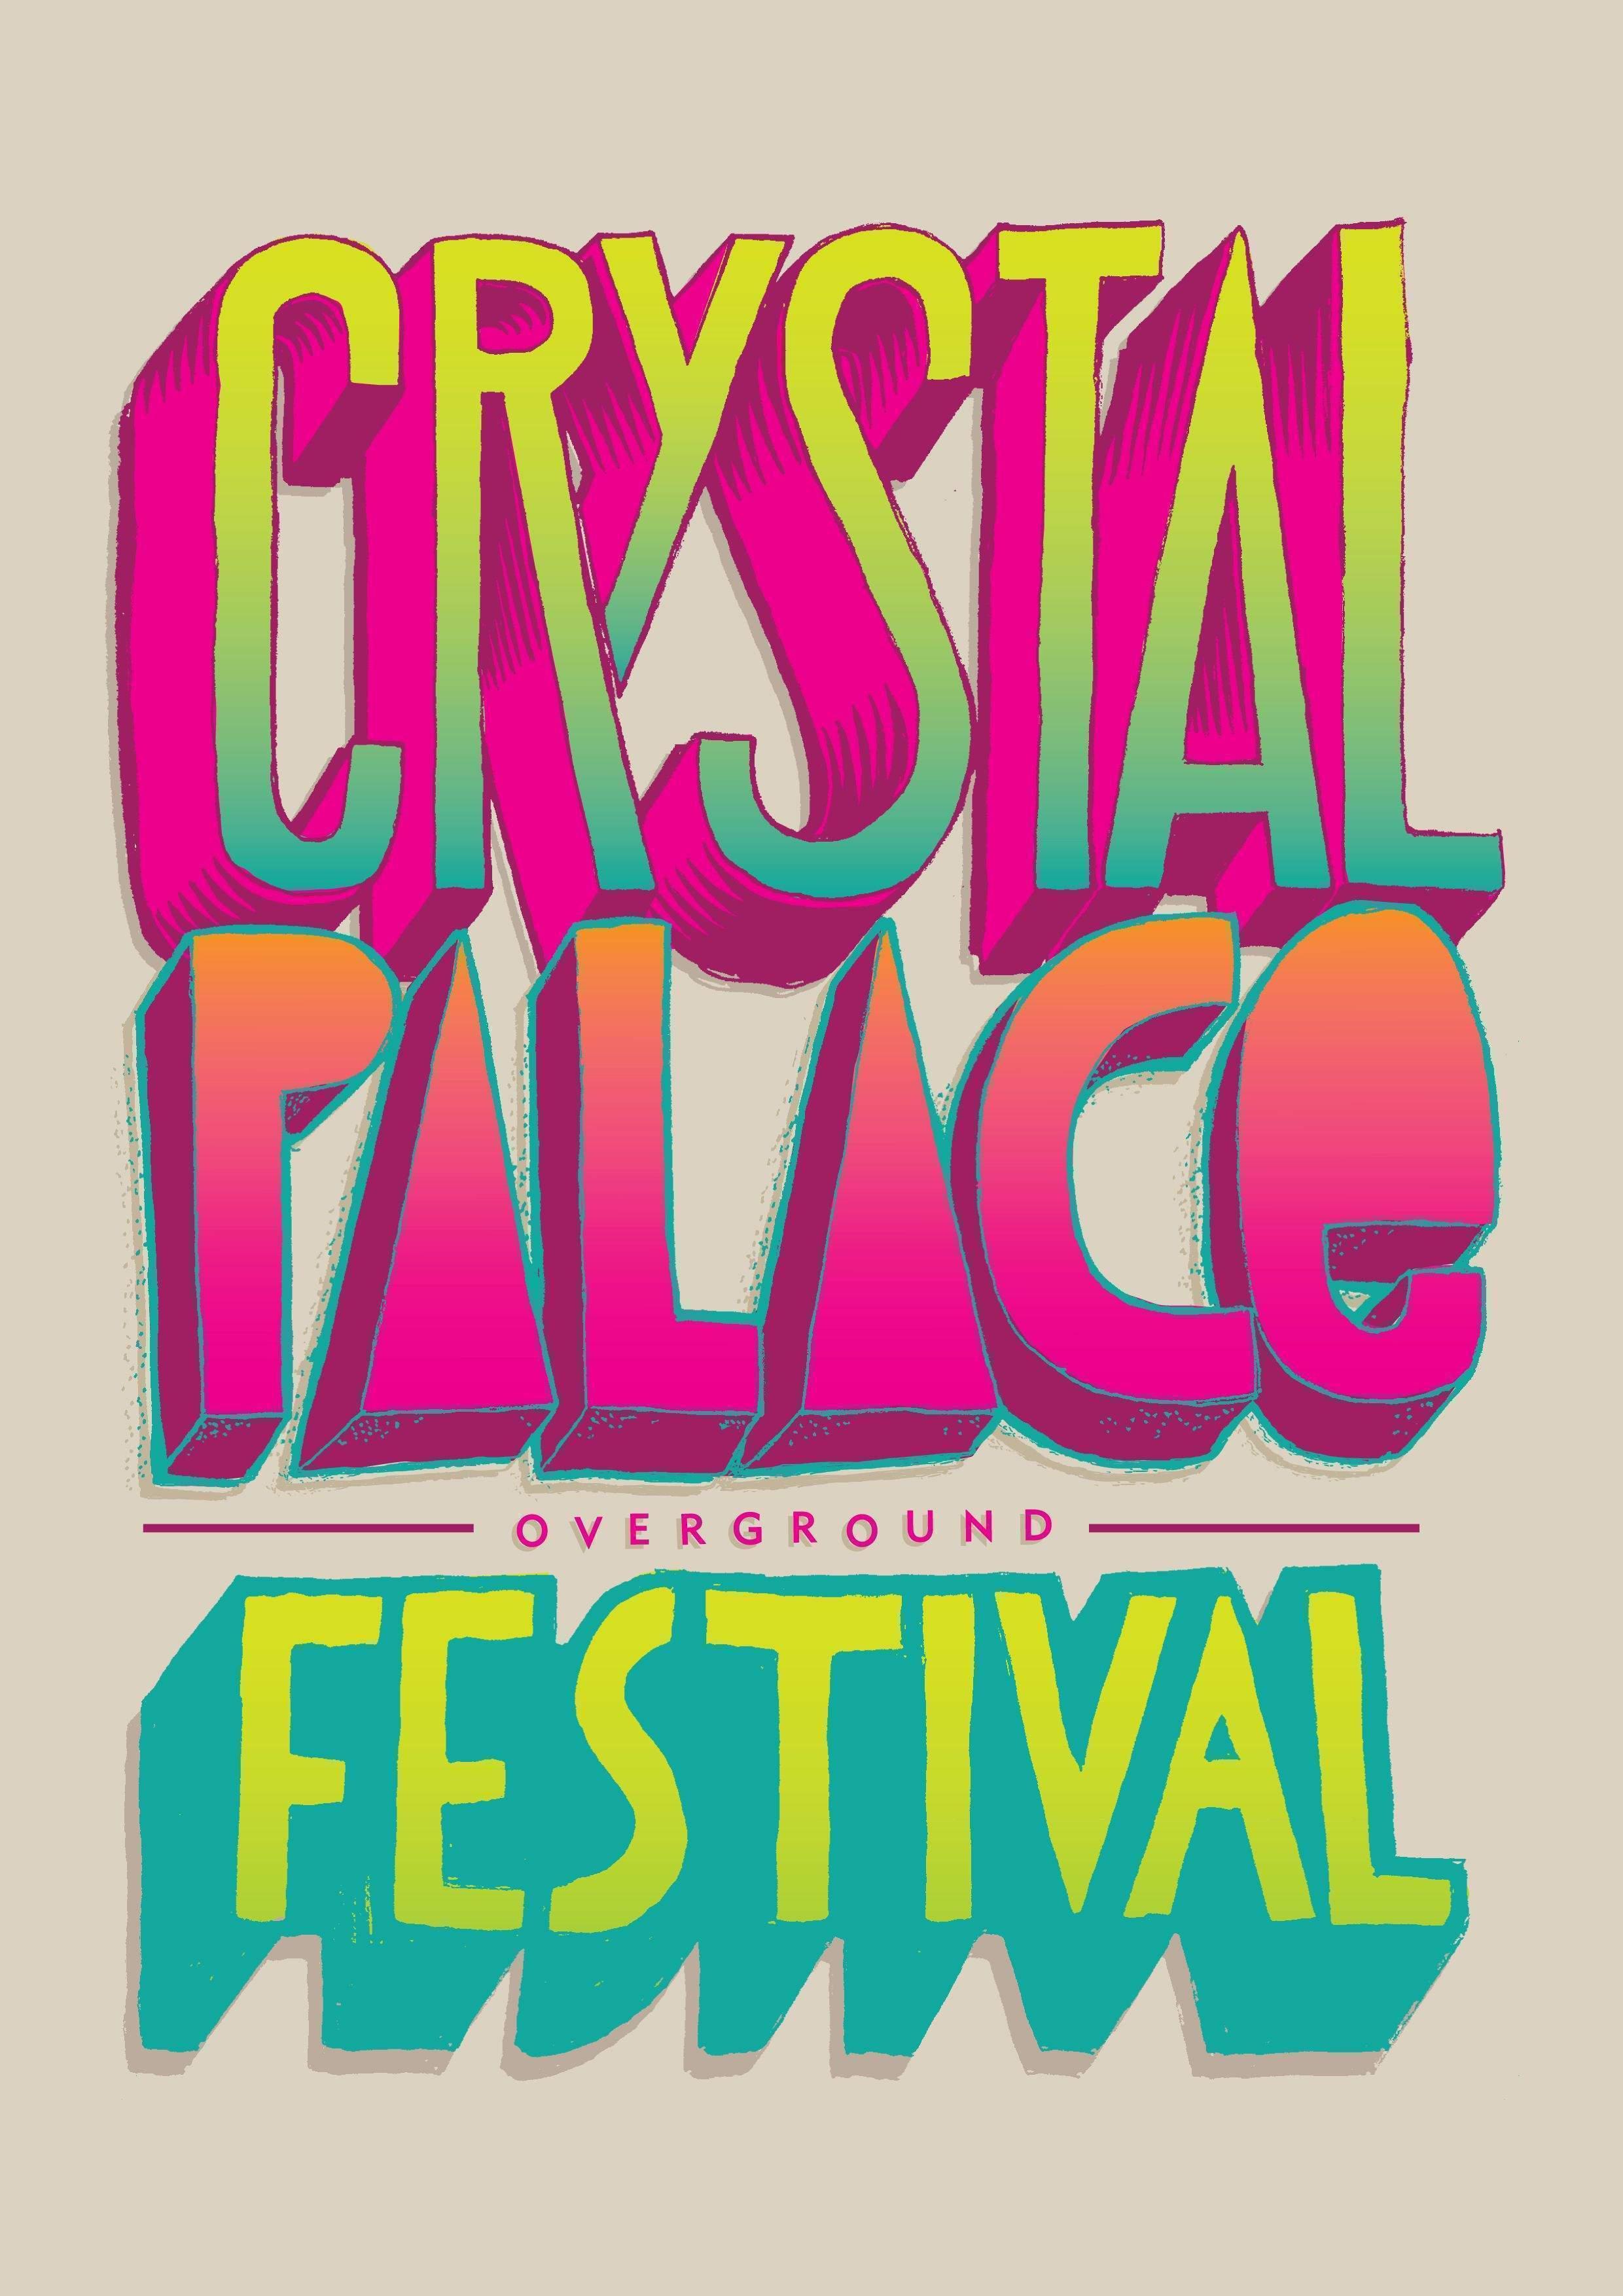 Overground Festival Announces Its 2015 Programme Of Events Inside Croydon